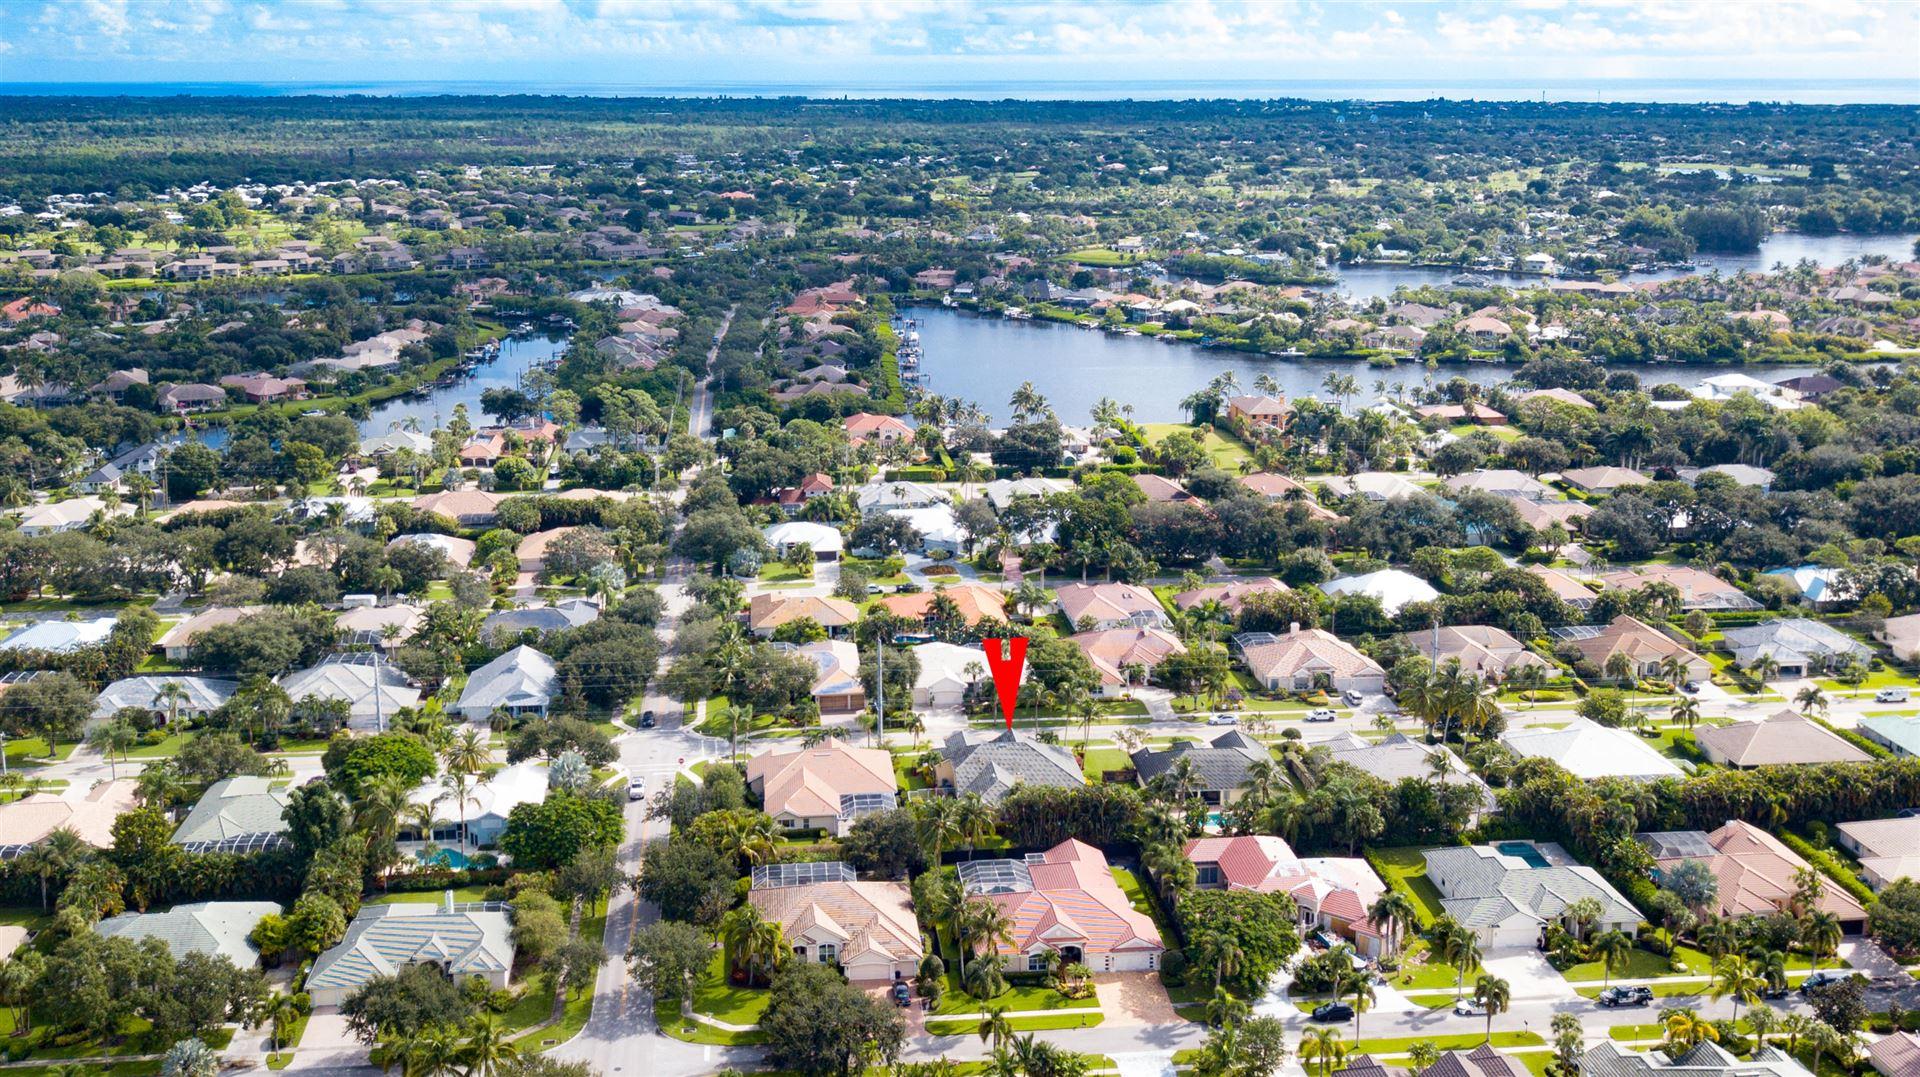 Photo of 19038 SE Loxahatchee River Road, Jupiter, FL 33458 (MLS # RX-10653944)